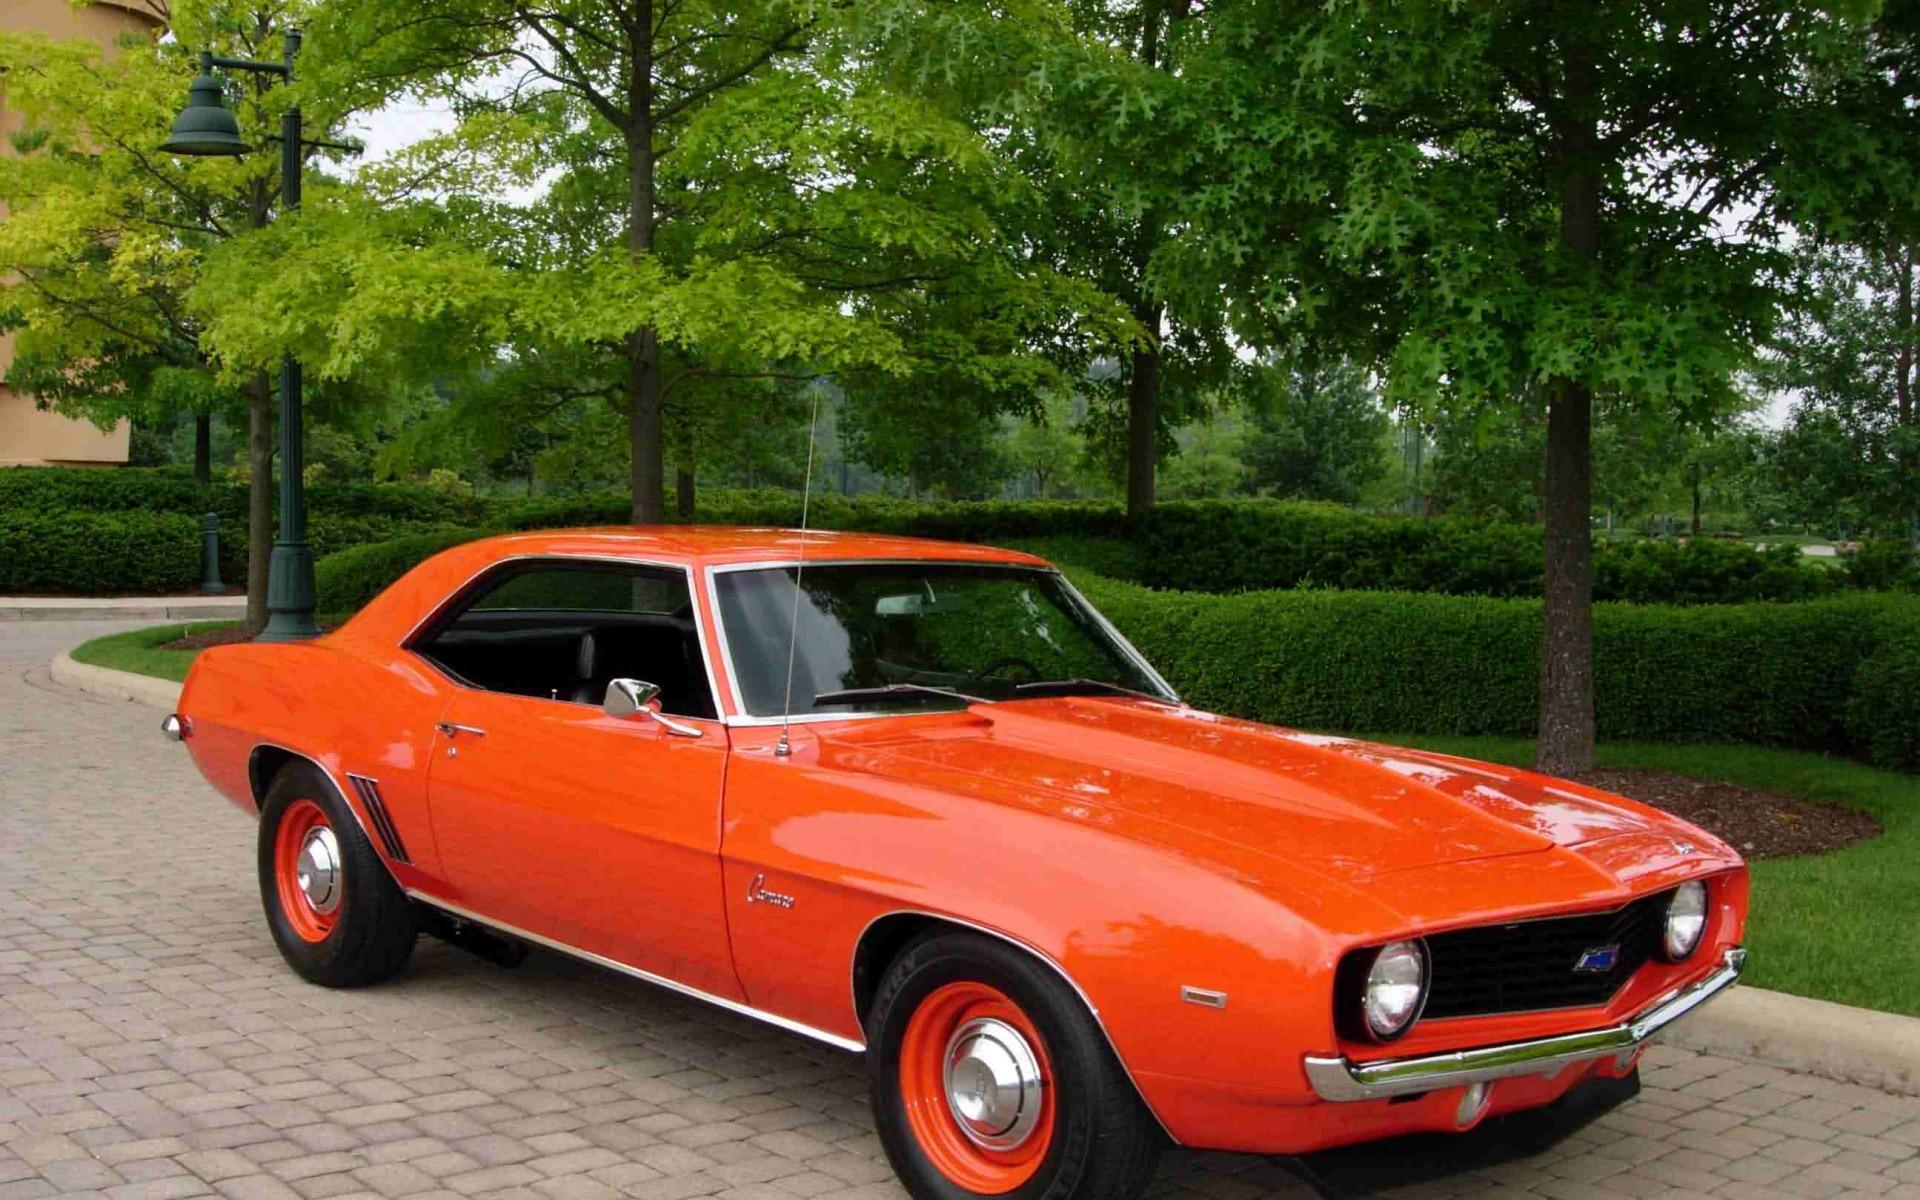 69 Chevy Camaro chevrolet orange vintage chevy 69 classic camaro 1920x1200